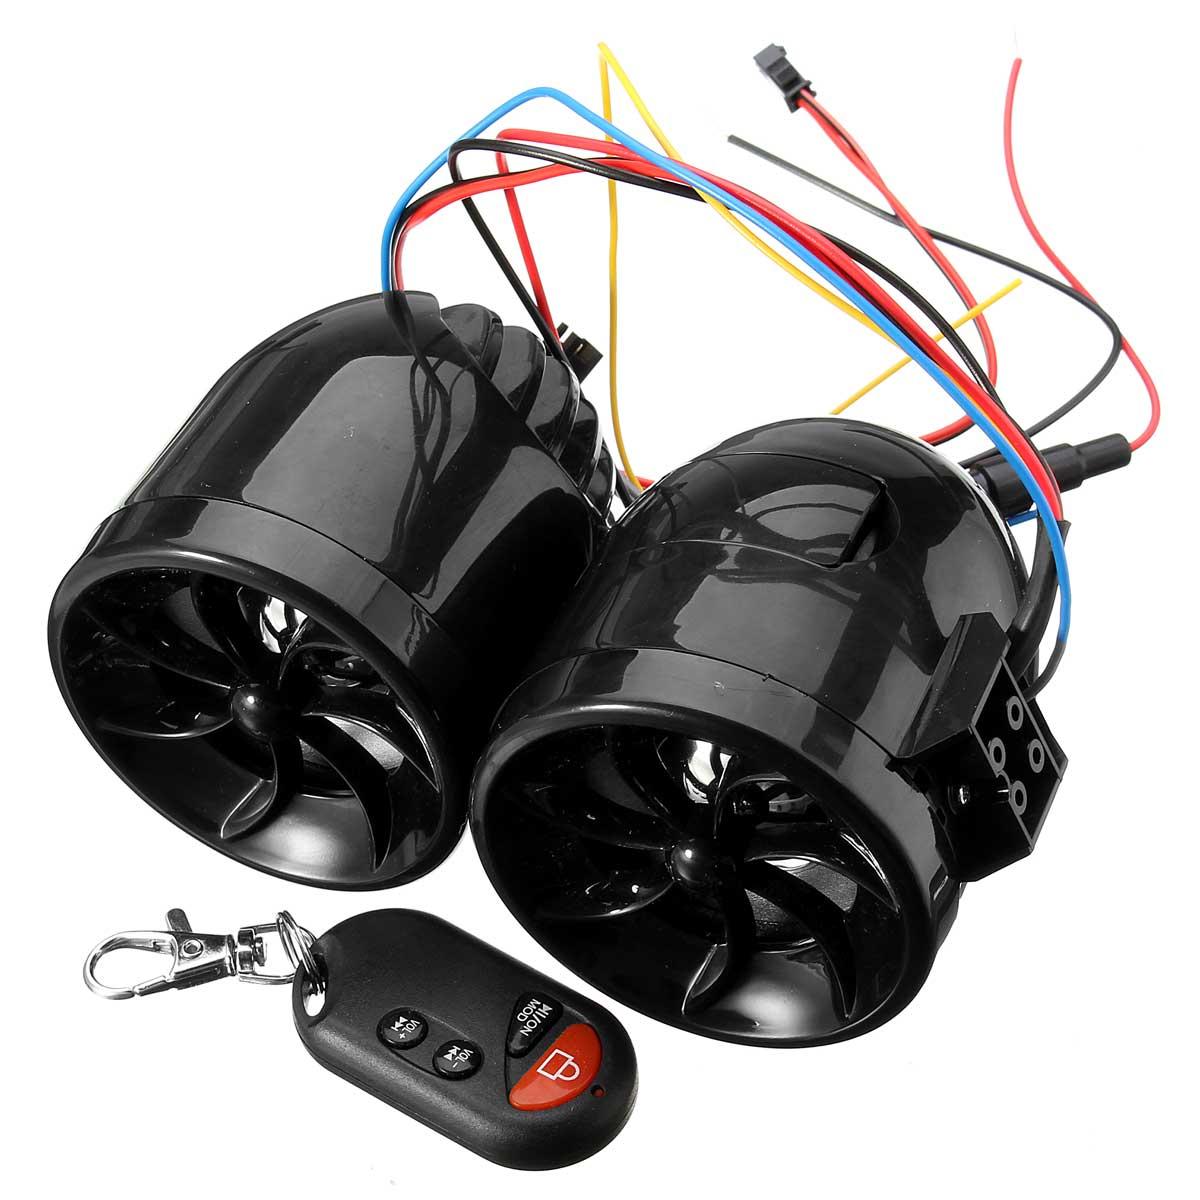 Motorcycle FM Mp3 Amplifier Waterproof Speakers Anti Theft Alarm Audio Stereo Player